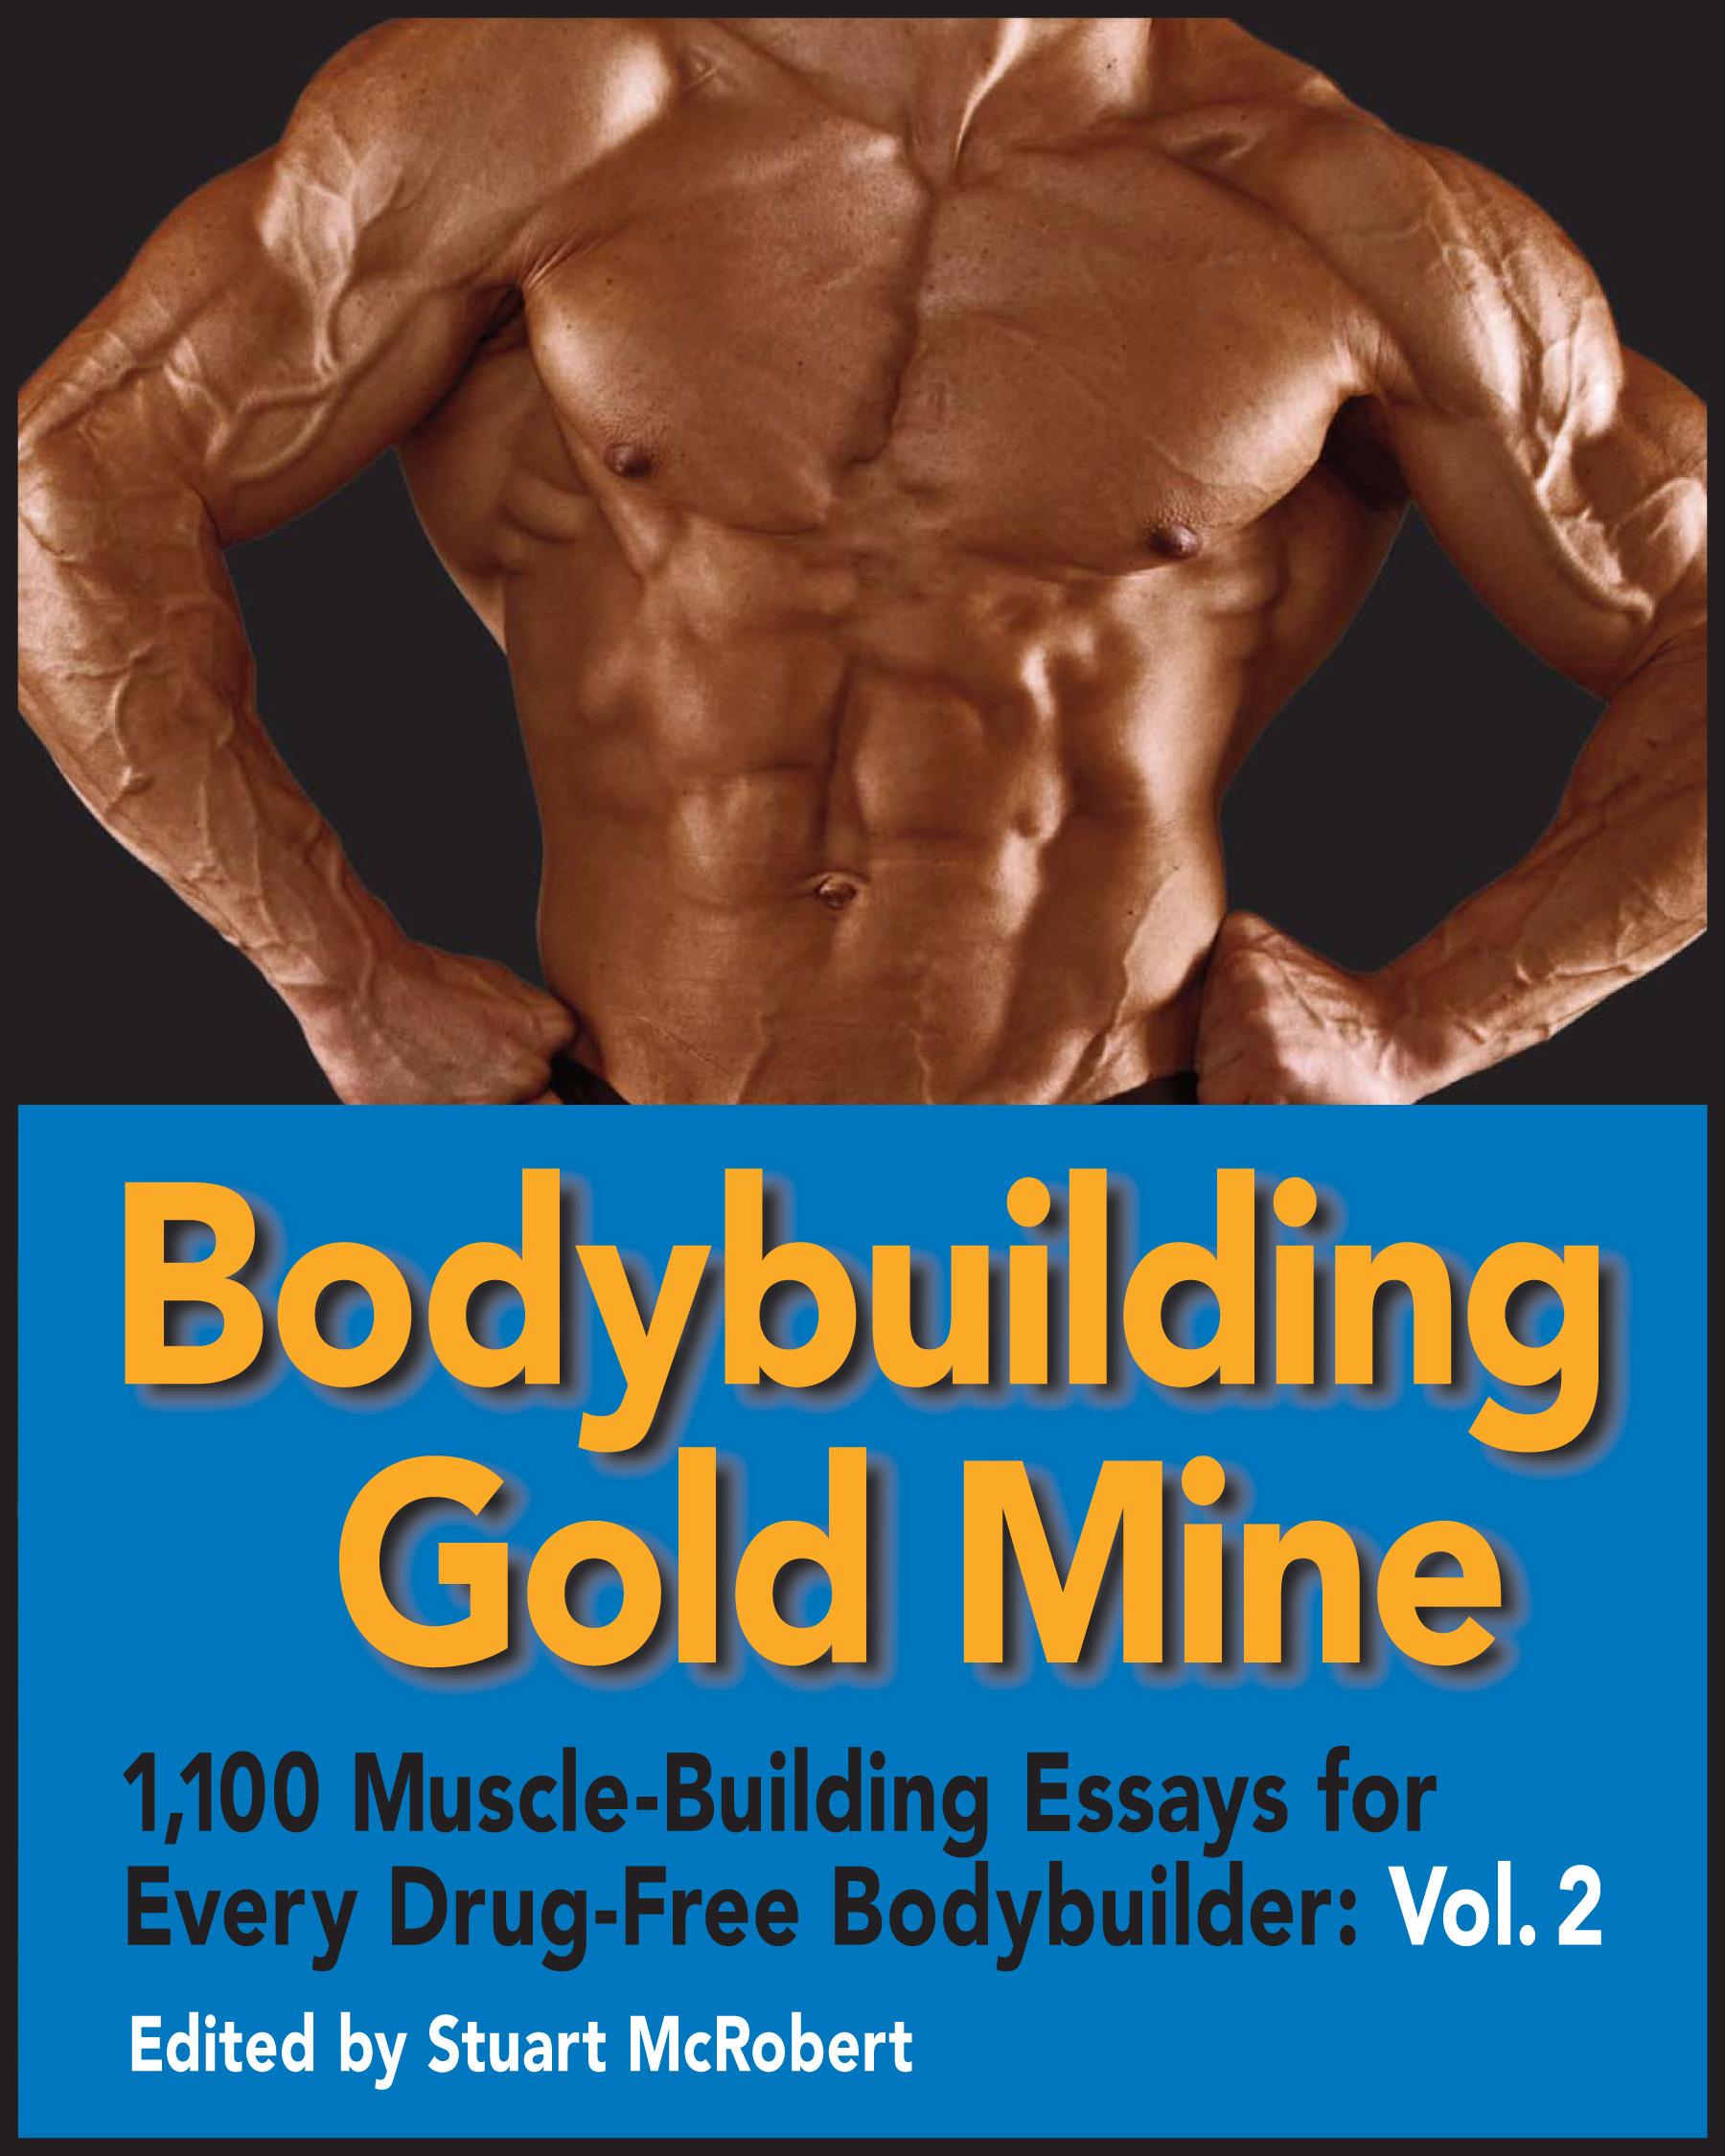 BODYBUILDING GOLD MINE, Vol. 2